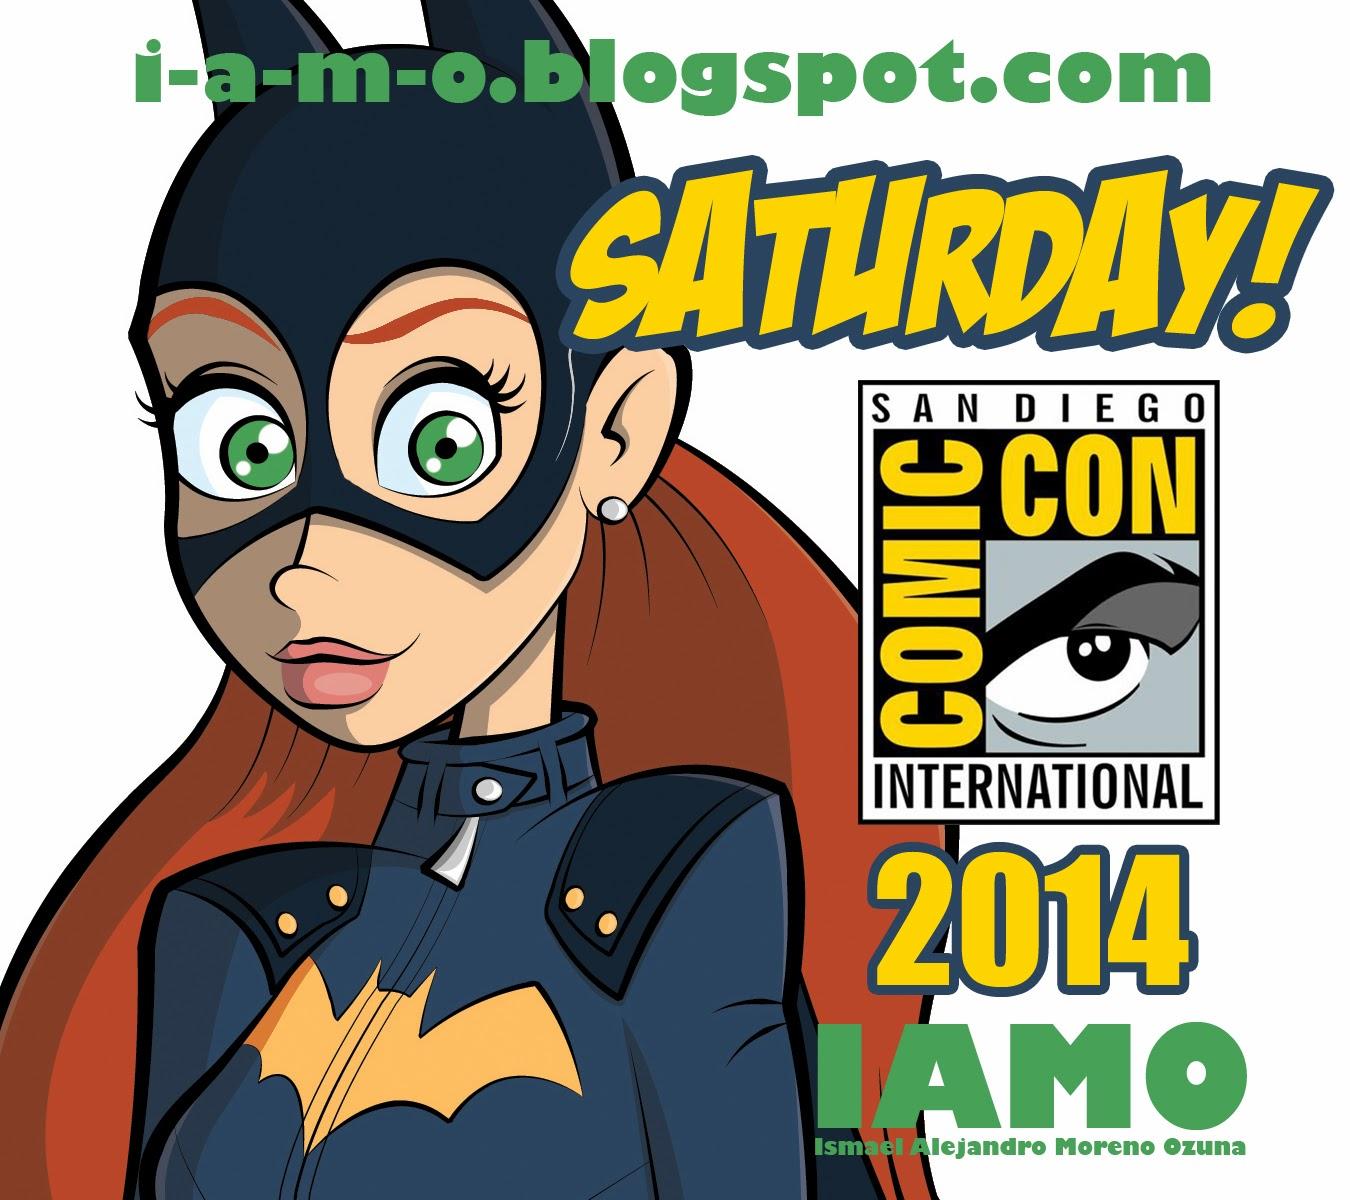 IAMO-SDCC-2014-Saturday_Badge+copy.jpg